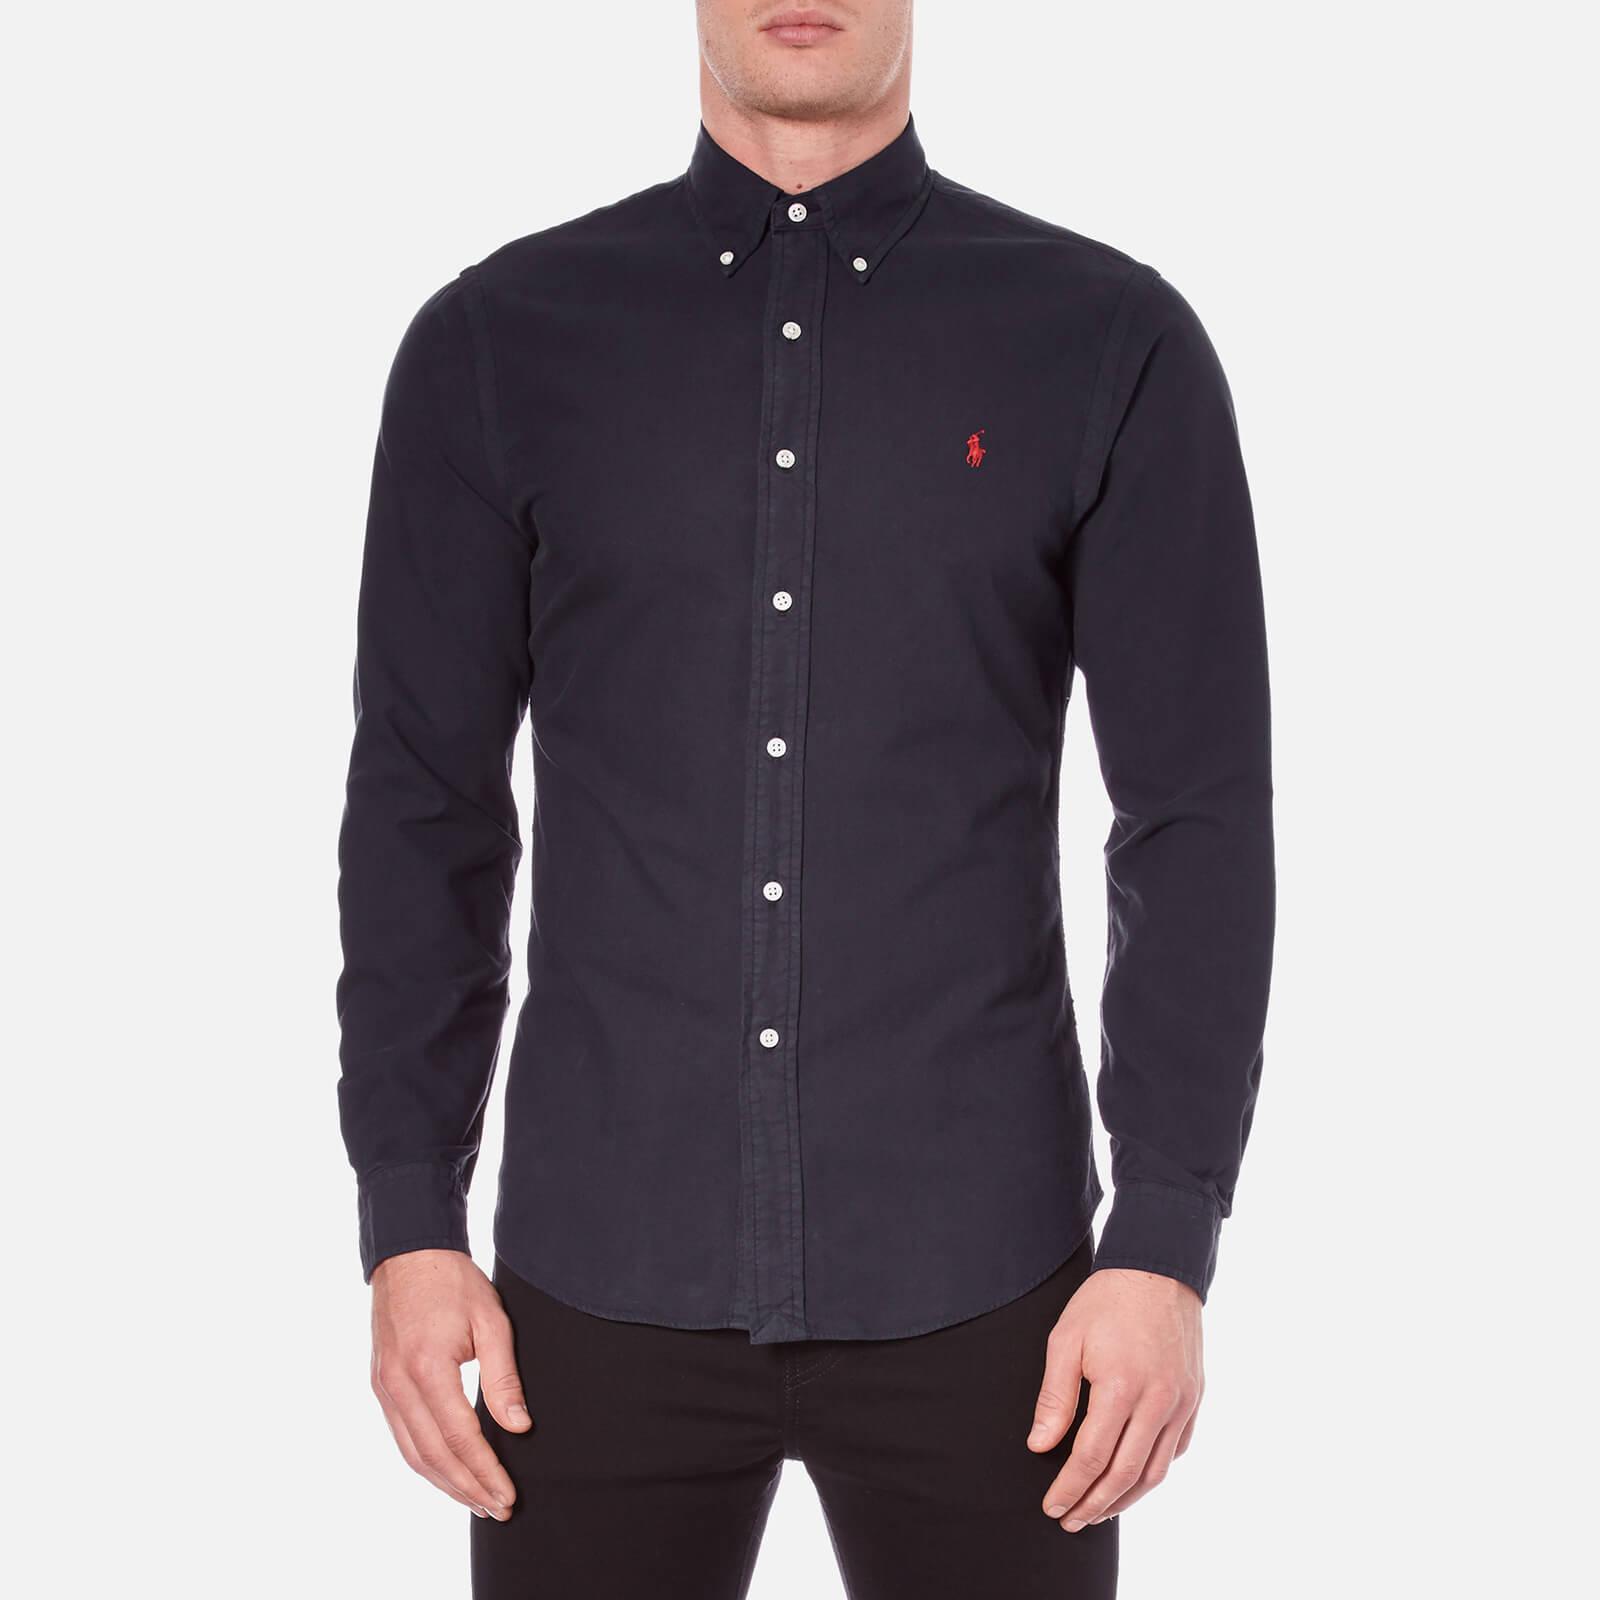 d5ccbb60b526ac Polo Ralph Lauren Men's Long Sleeve Button Down Shirt - Hunter Navy - Free  UK Delivery over £50